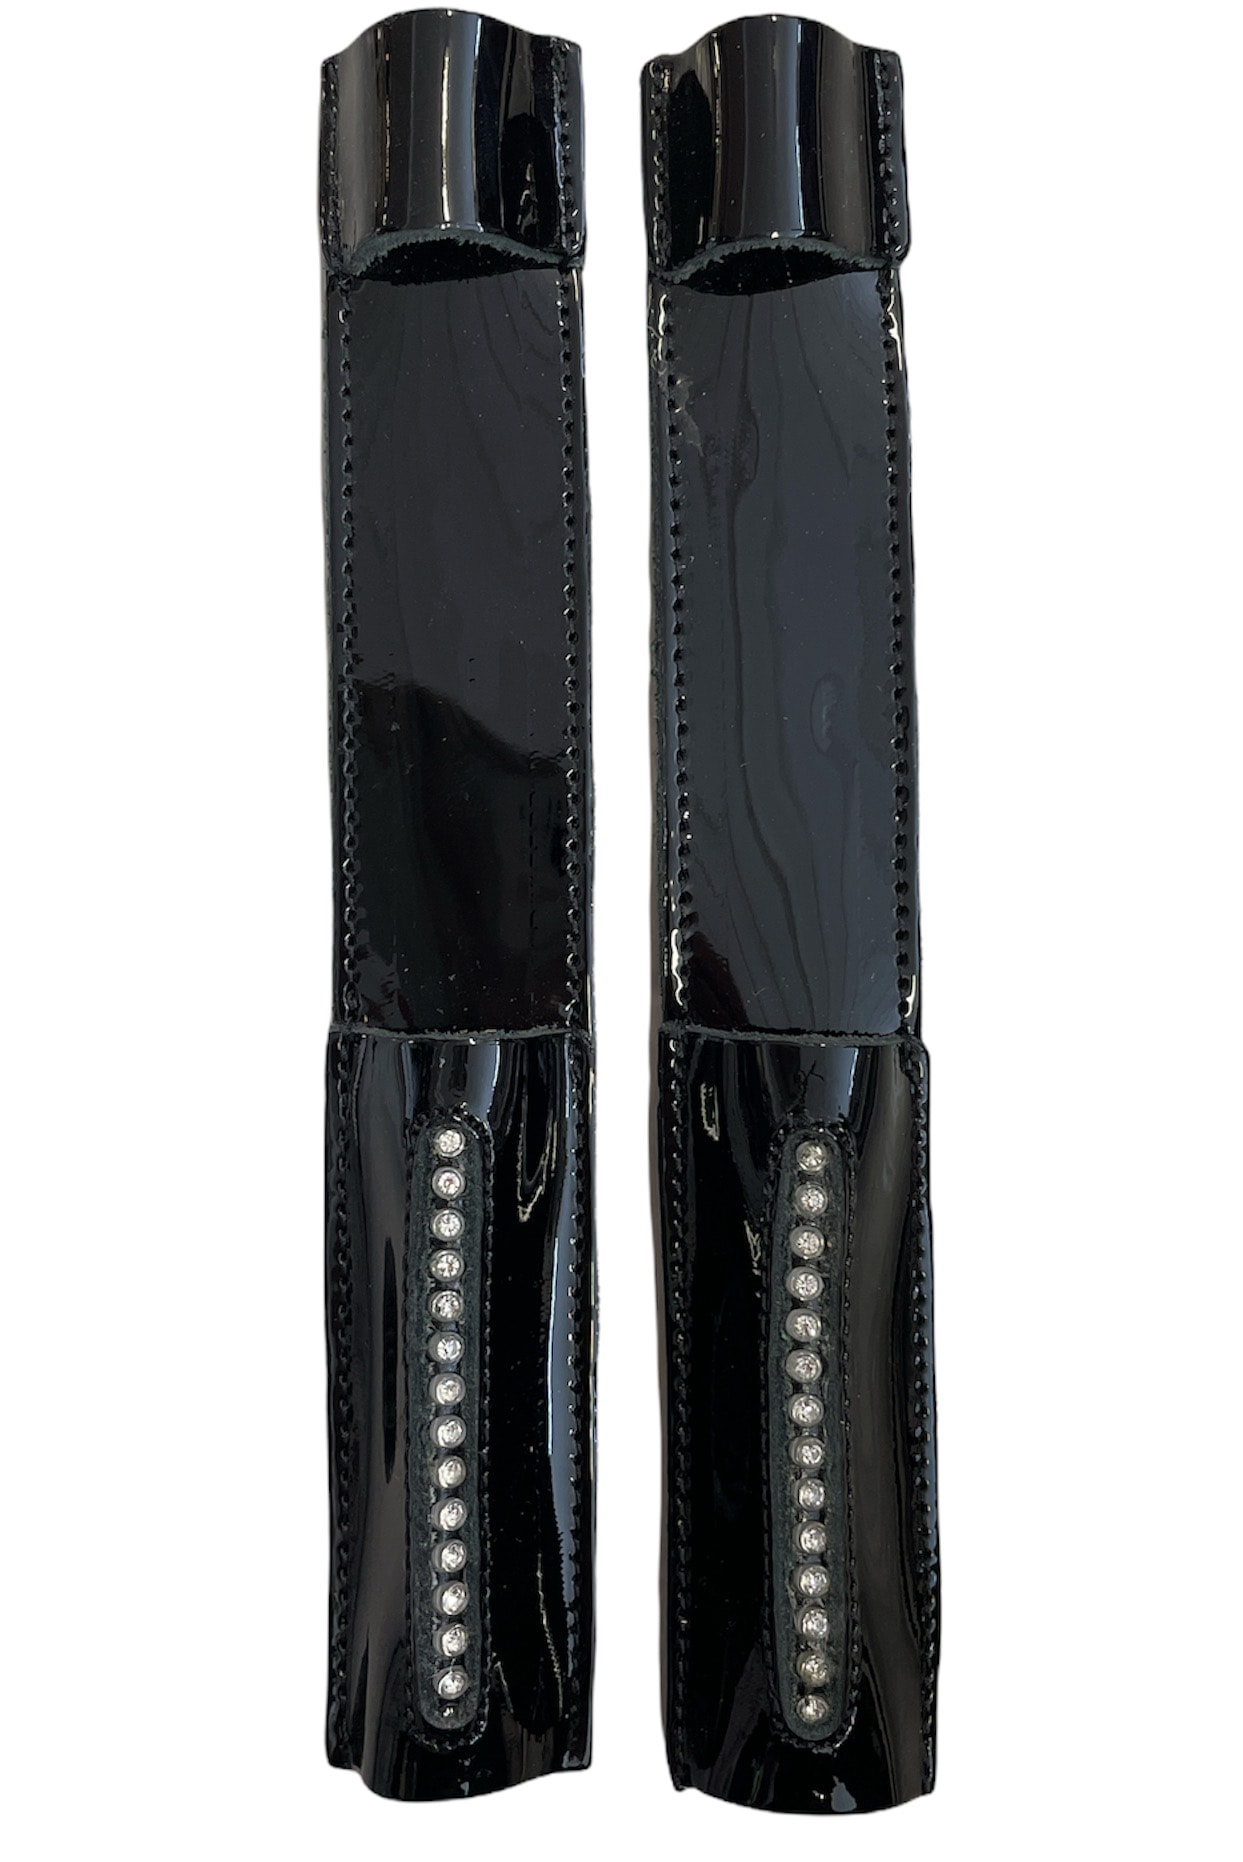 Celeris Spur Protectors - Patent Black with Diamant